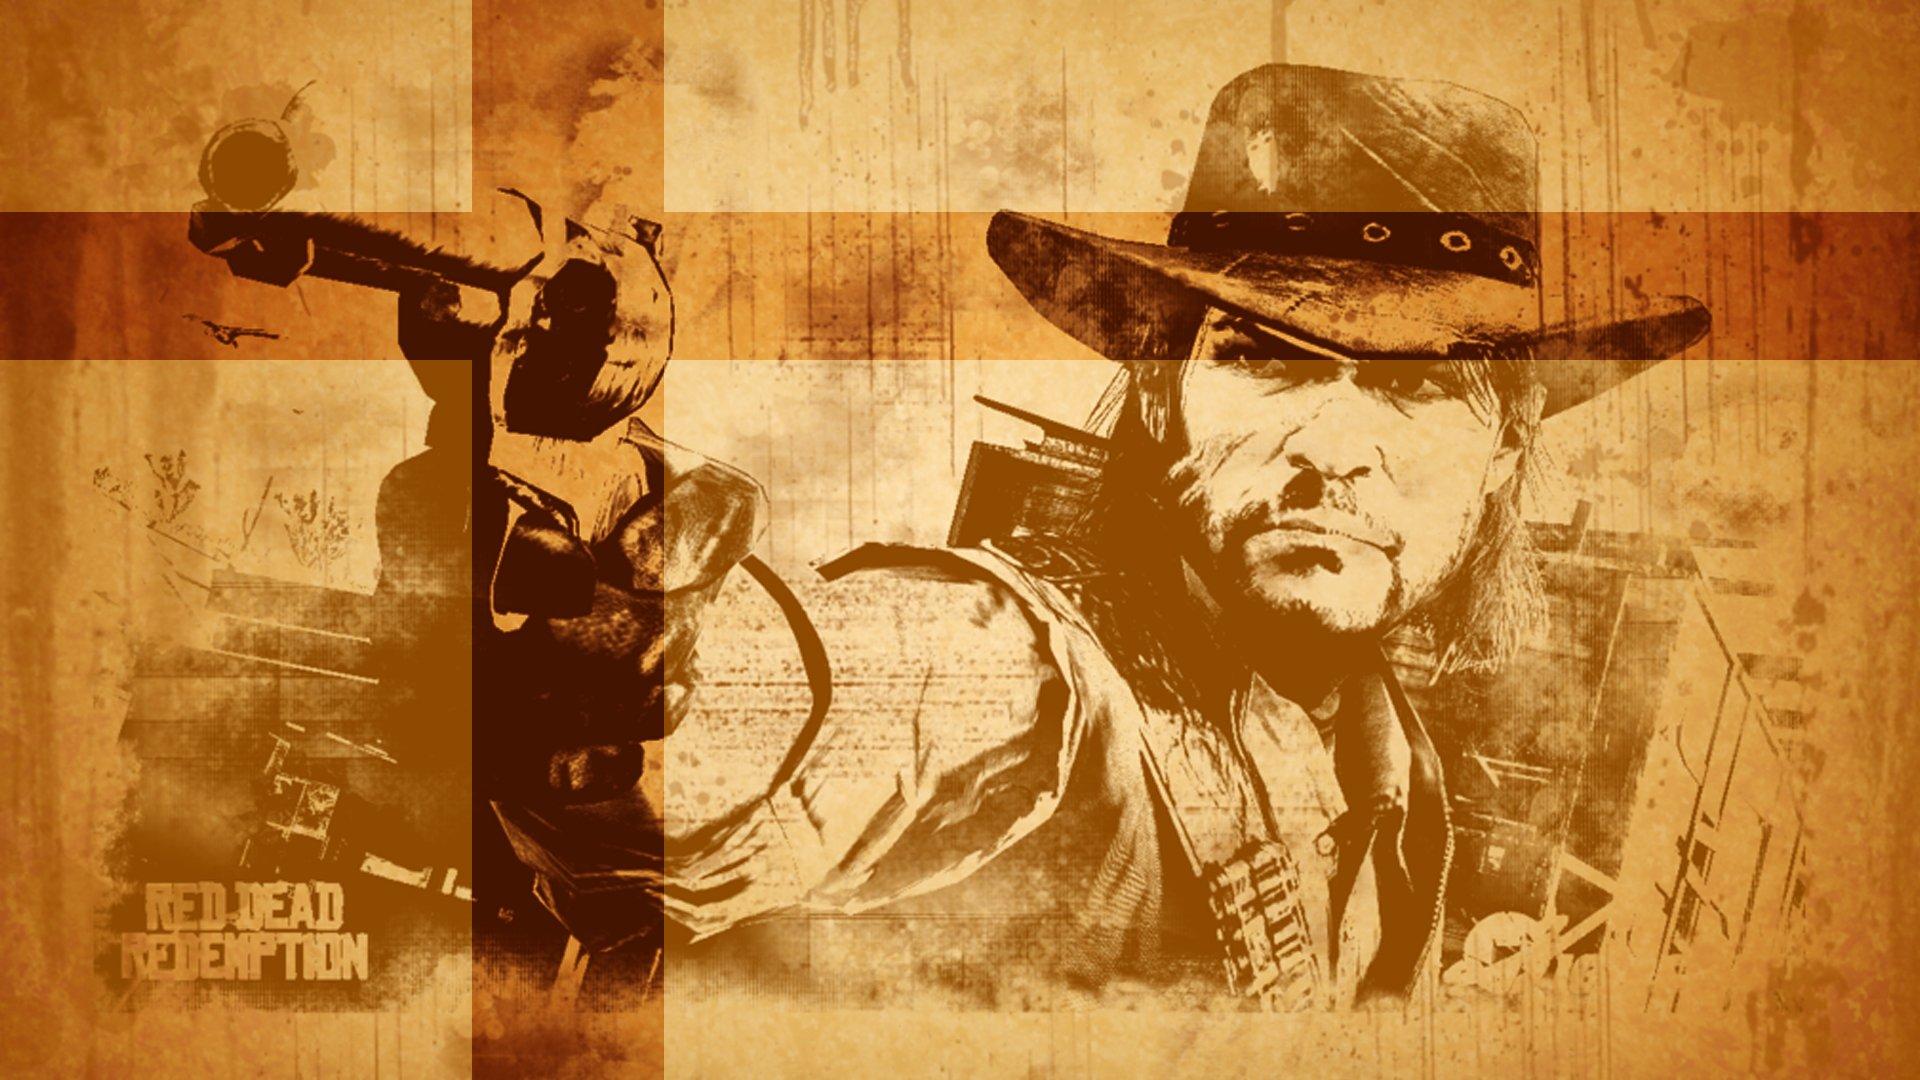 Dirty Harry Quotes Wallpaper Western Wallpapers Download Free Pixelstalk Net